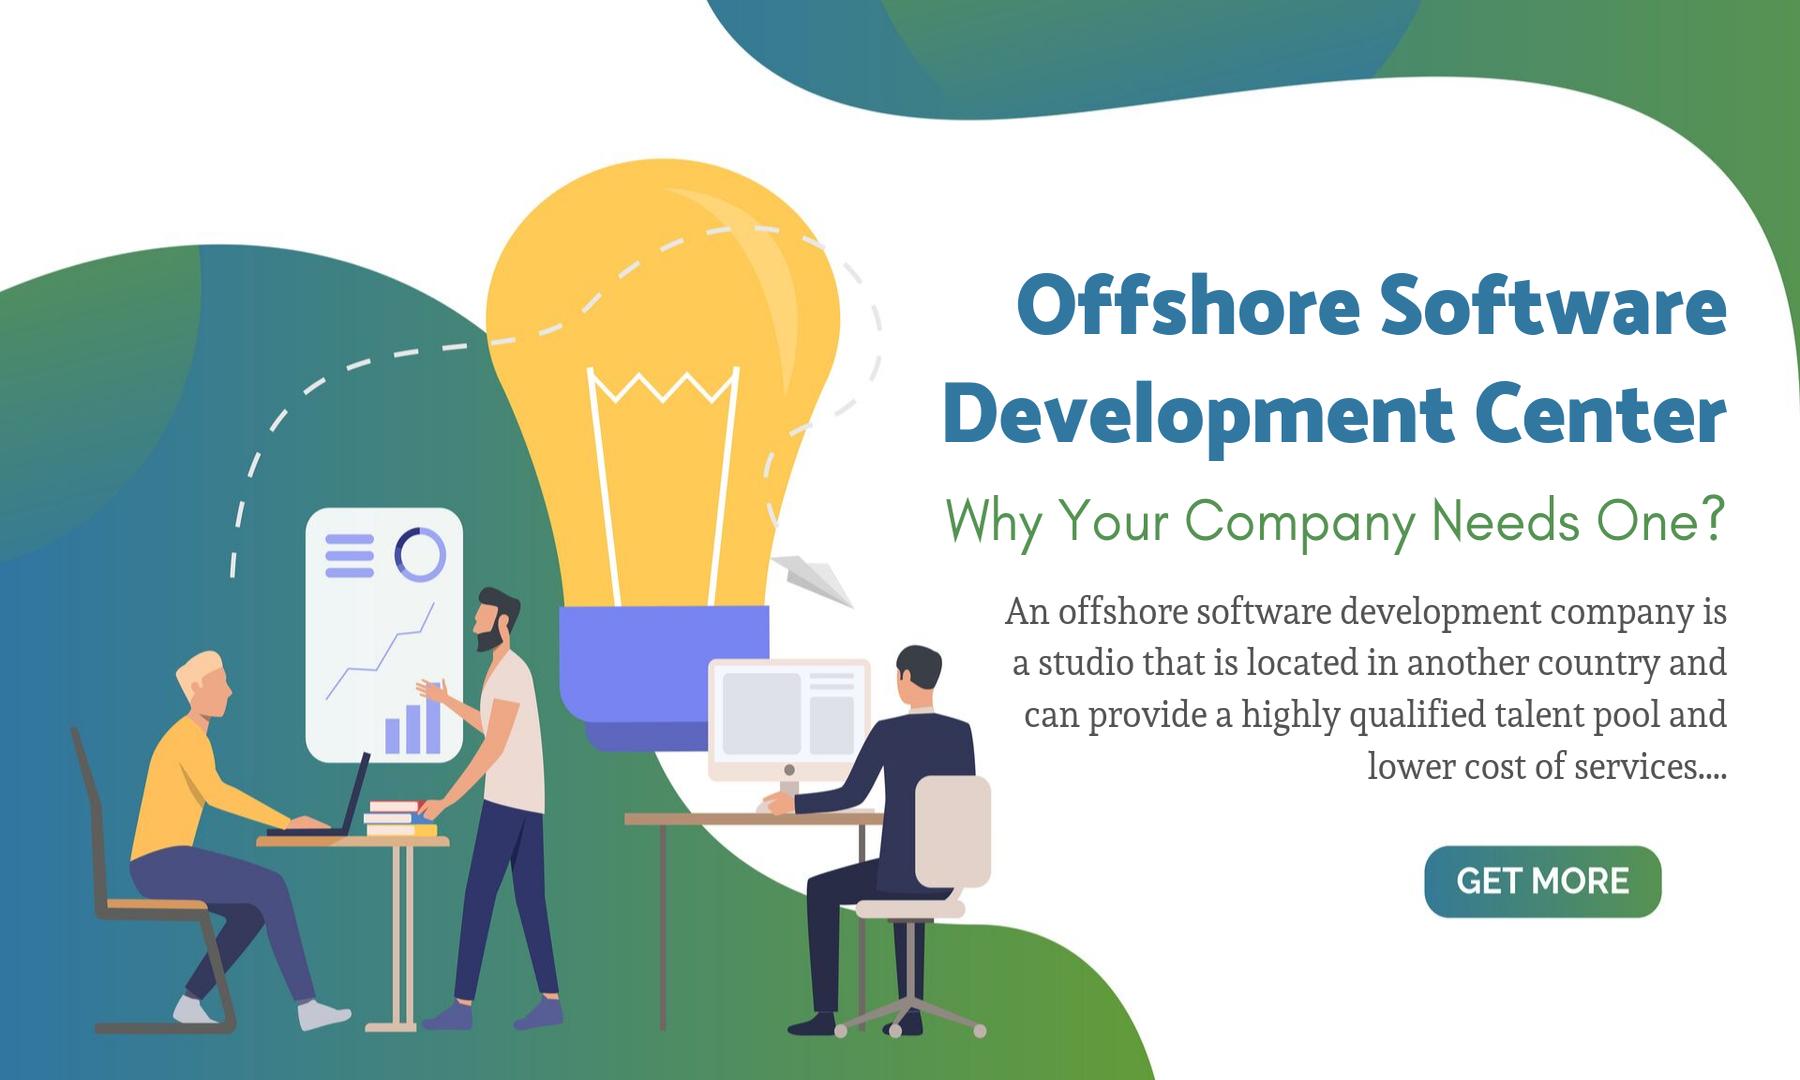 Offshore Software Development Center